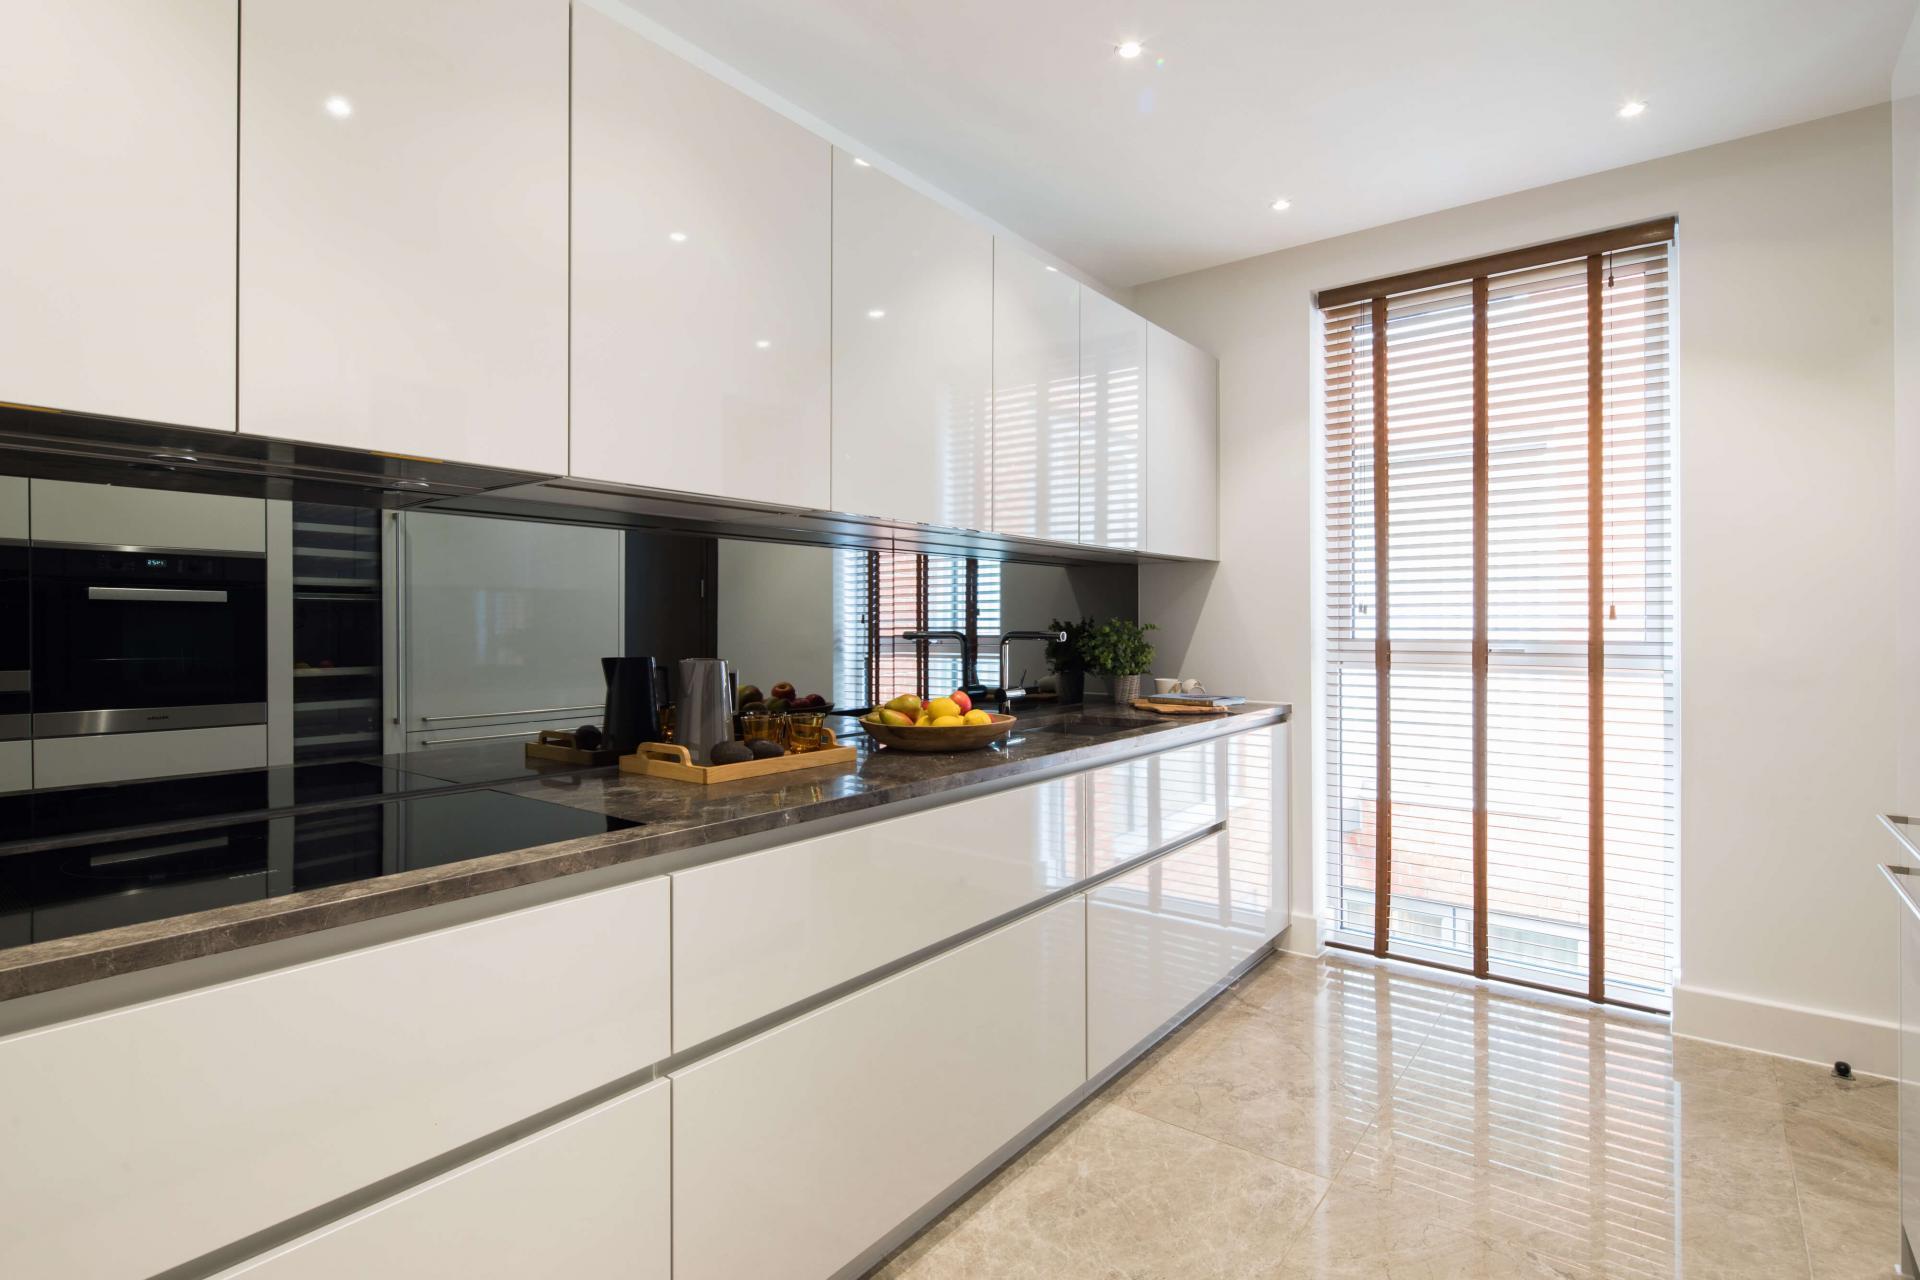 Kitchen at Logan Place Apartments, Kensington, London - Citybase Apartments